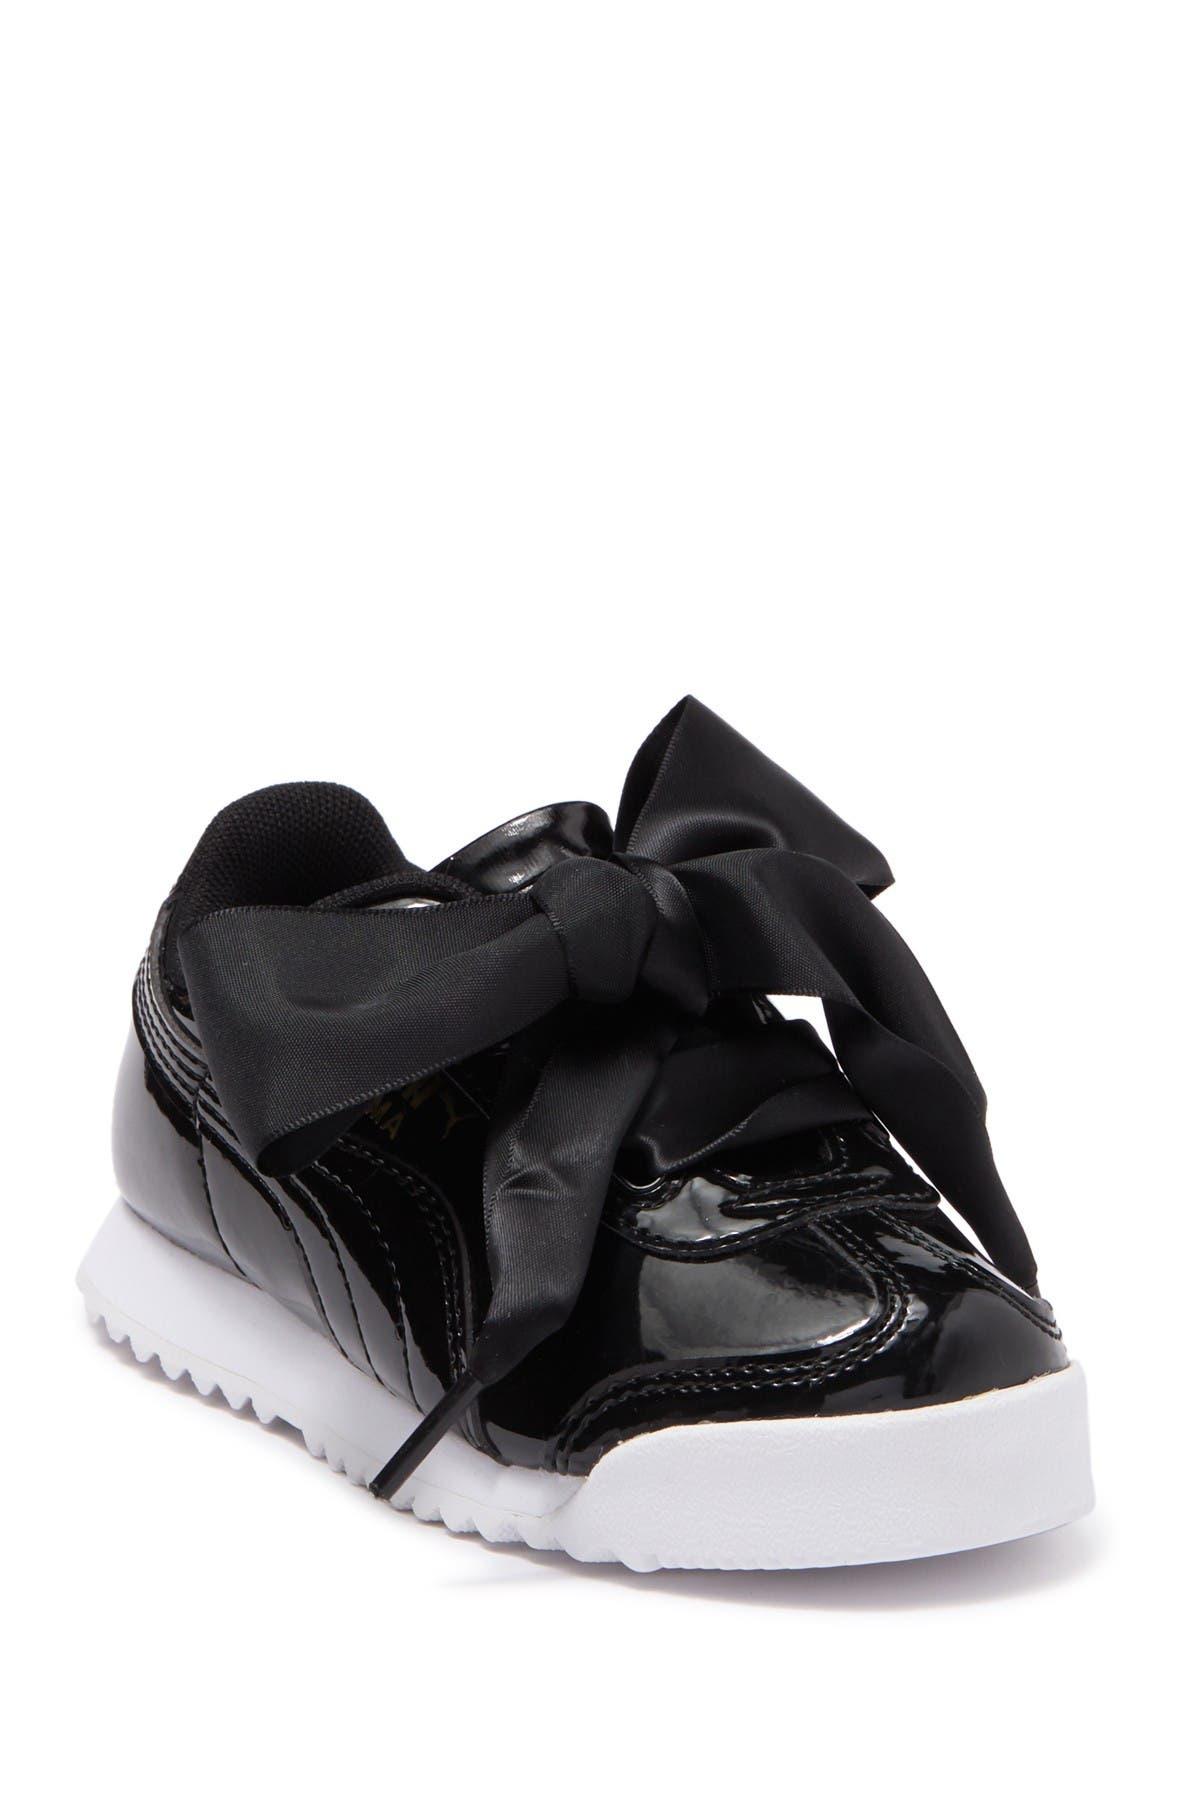 PUMA | Roma Heart Patent Sneaker